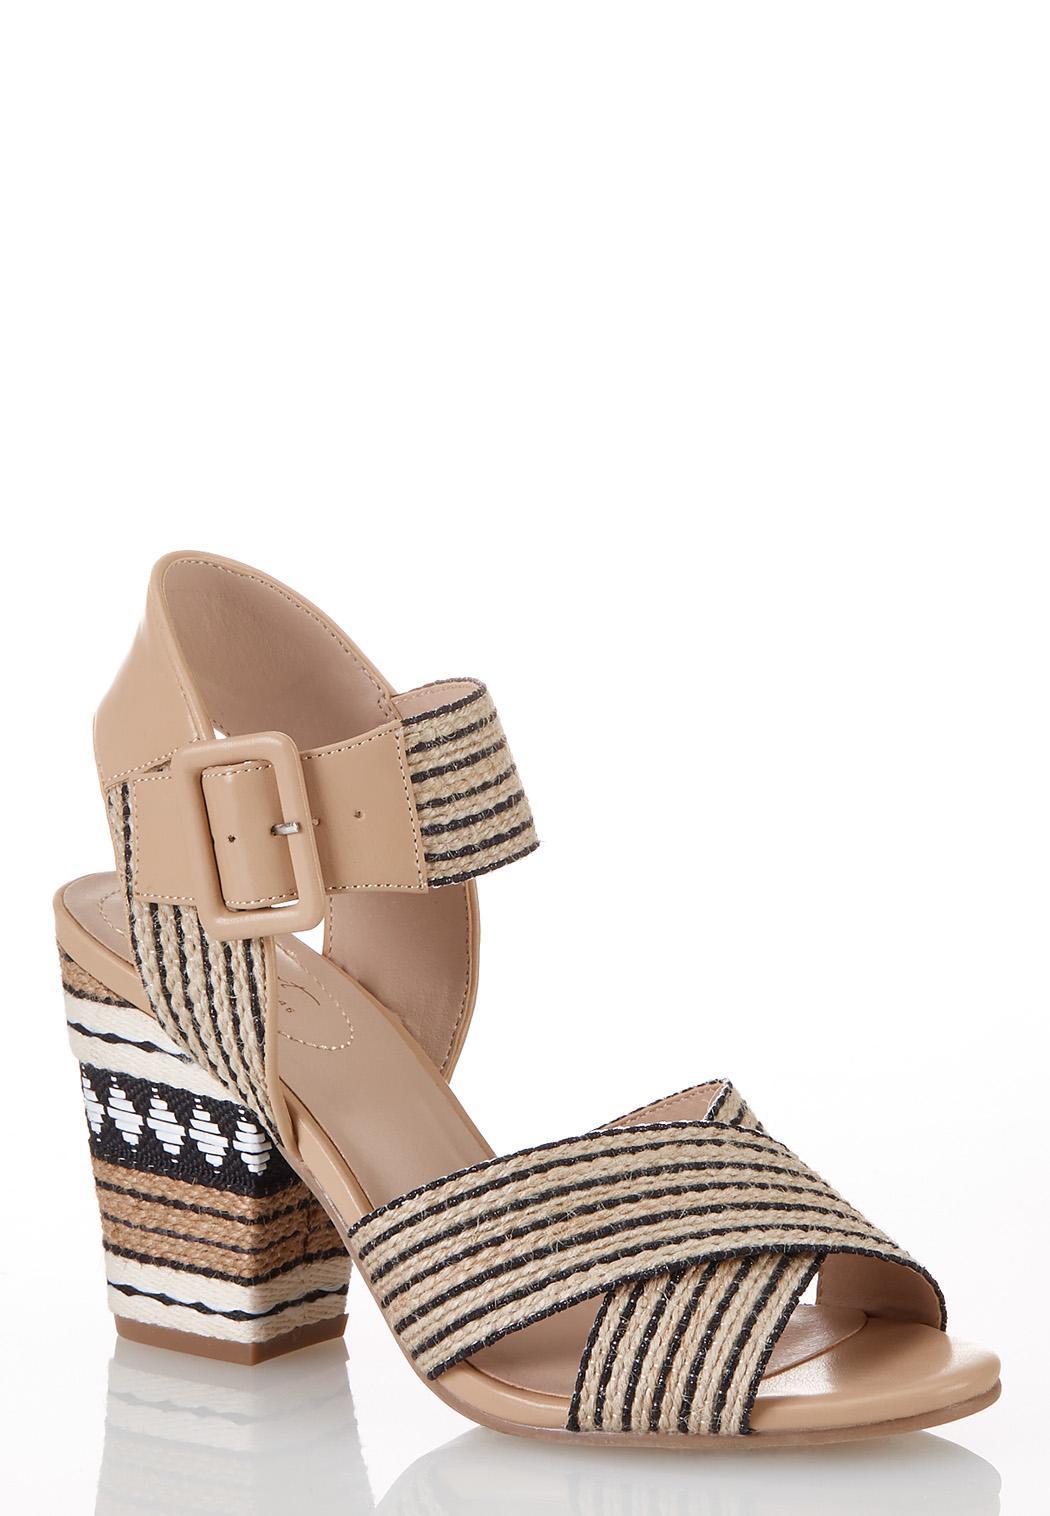 Black White Raffia Heeled Sandals